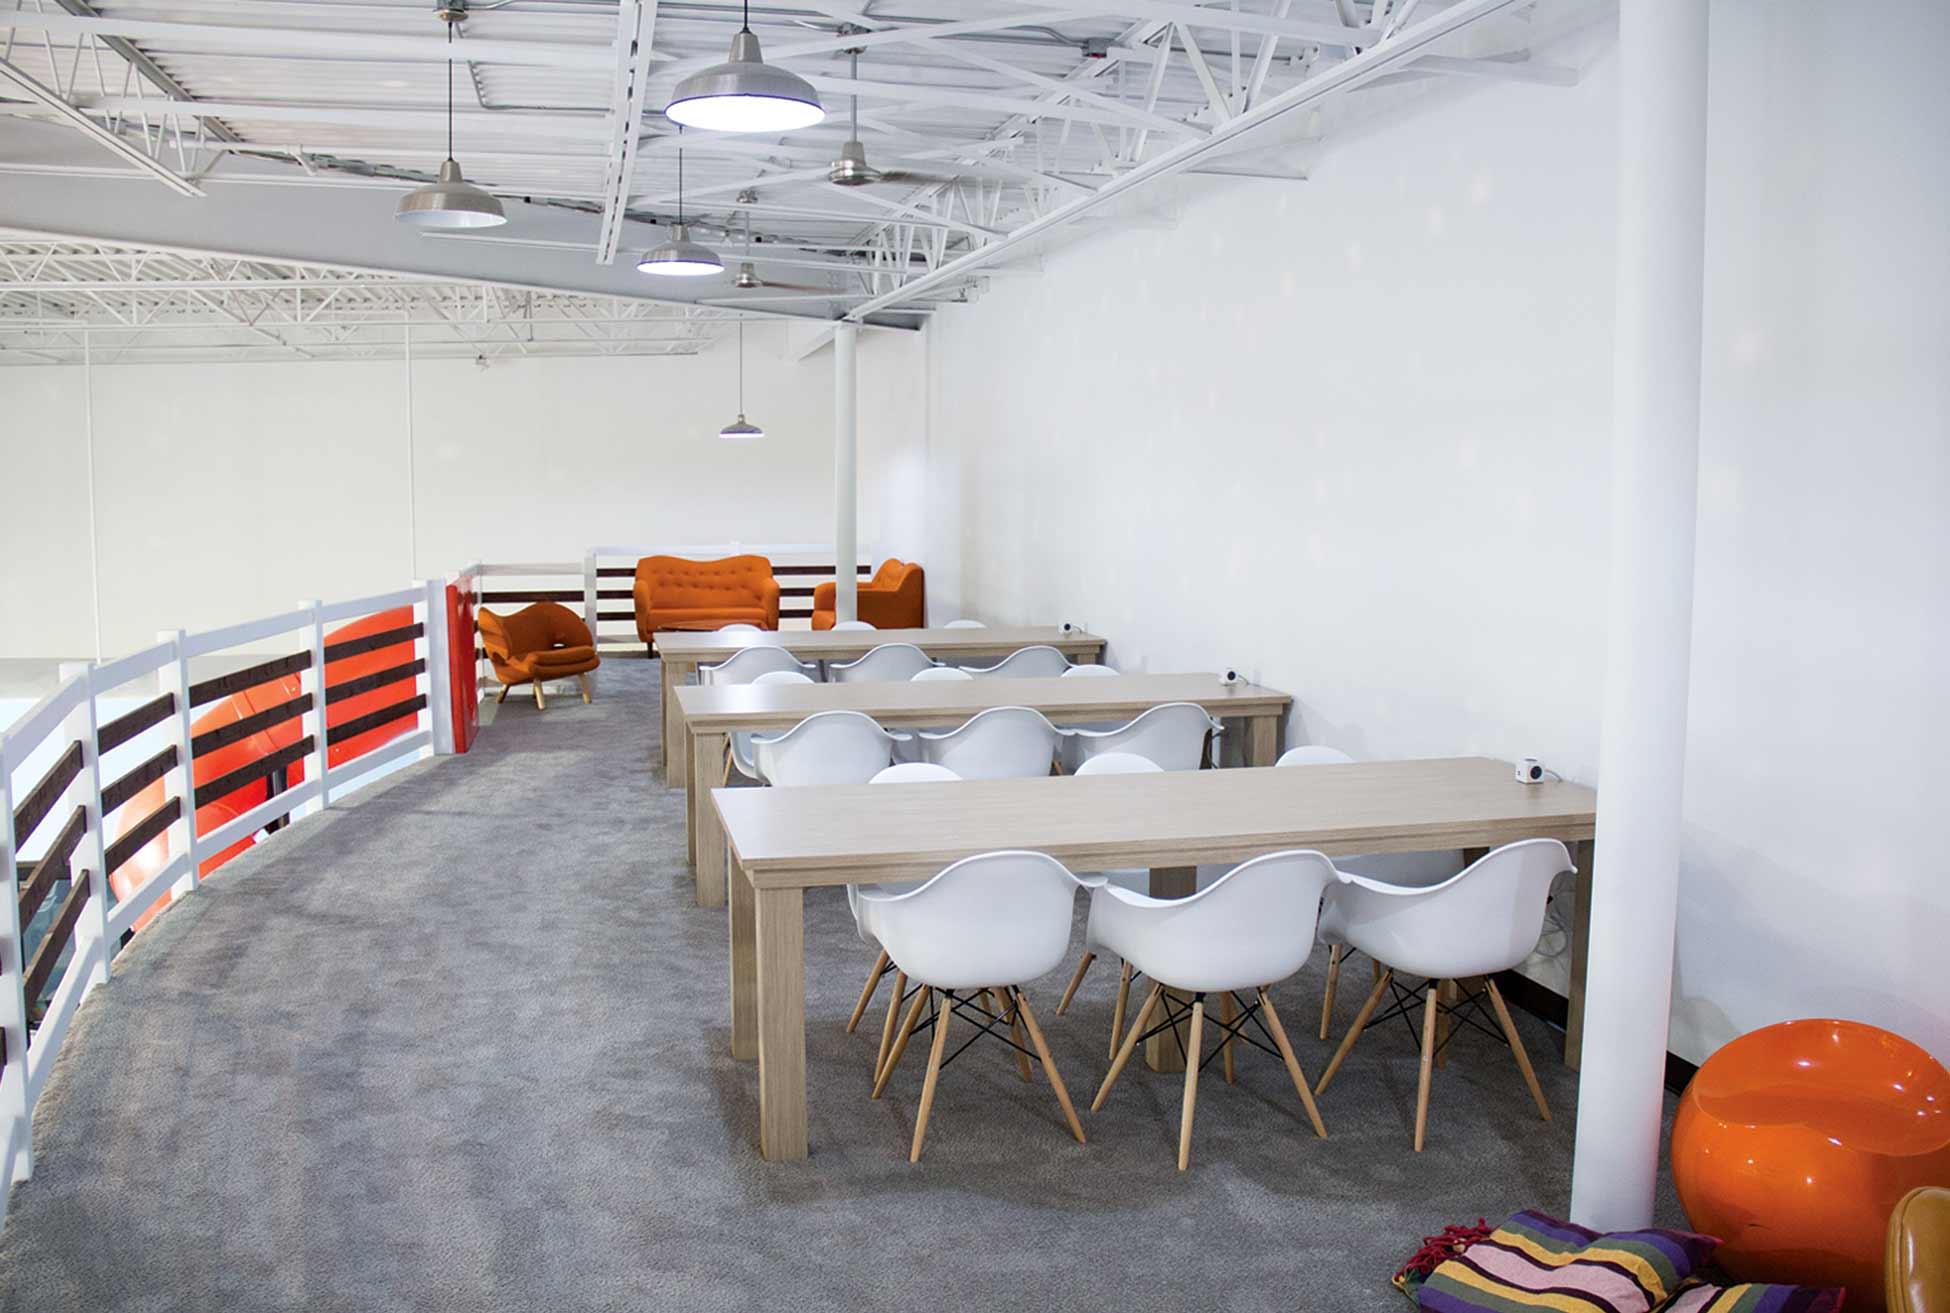 theworklodge_interior-loft.jpg